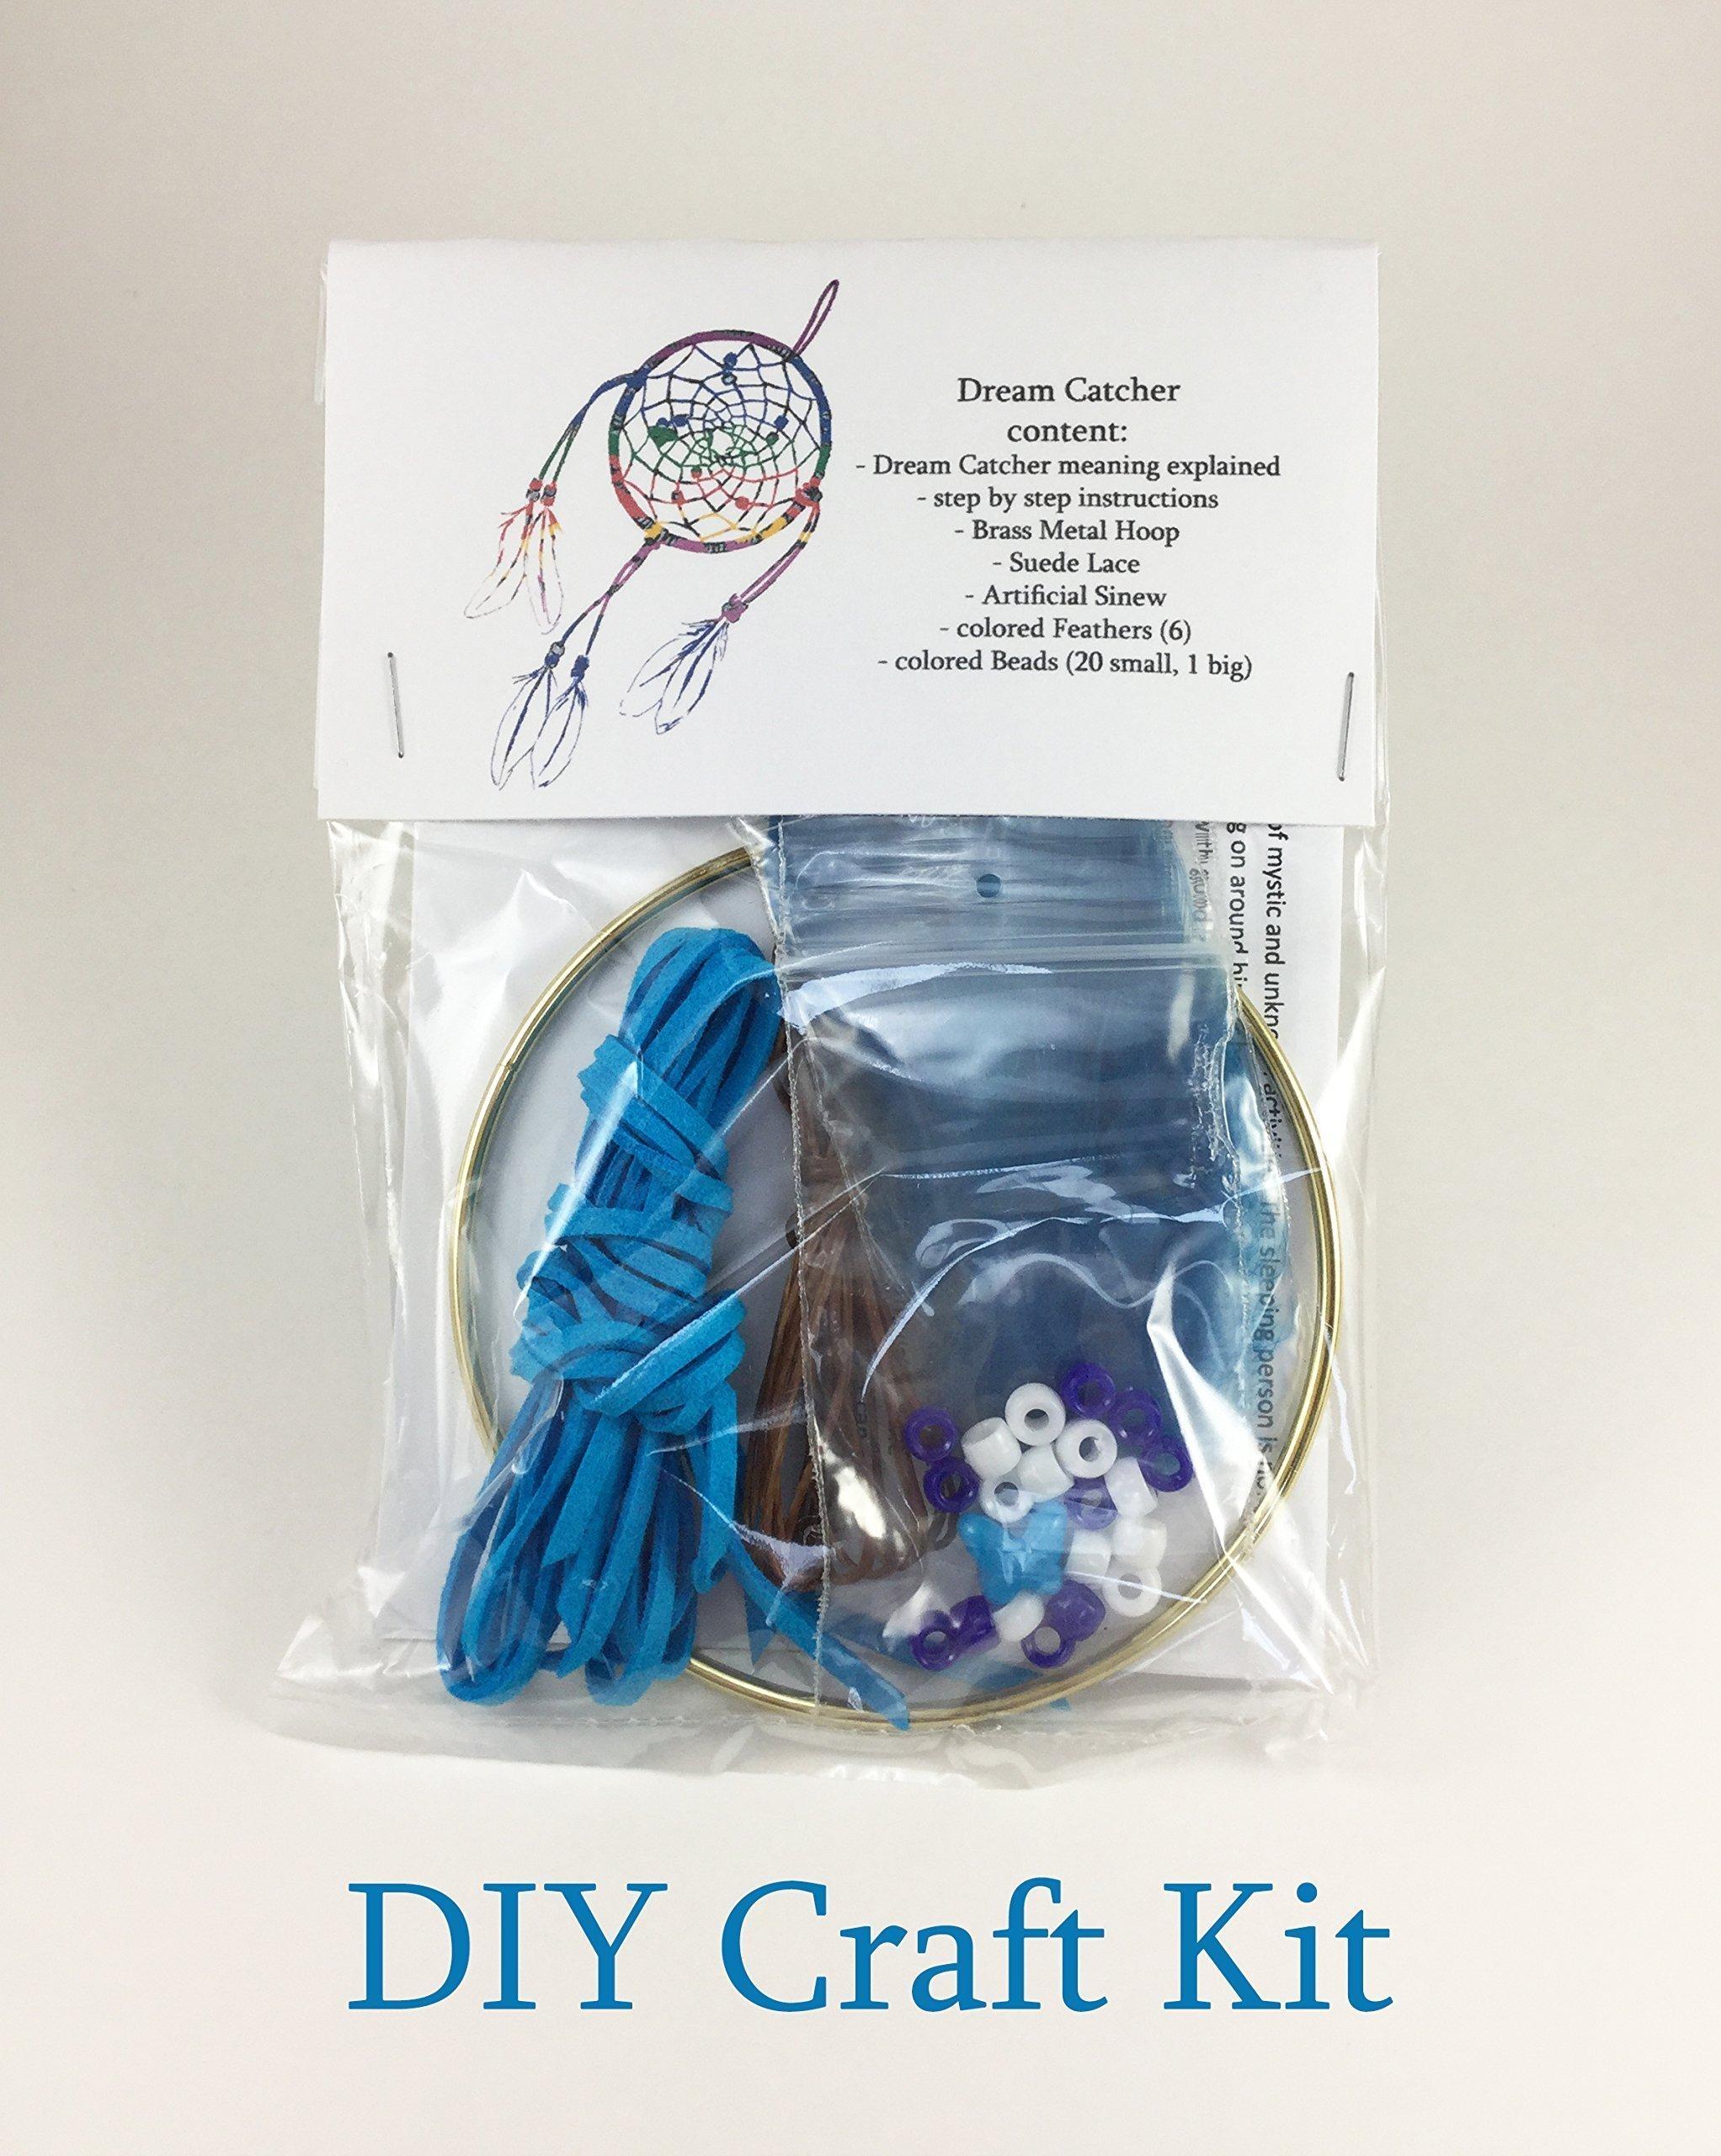 Blue Dream Catcher Craft kit, DIY Dream Catcher, children's craft kits, how to make a dream catcher